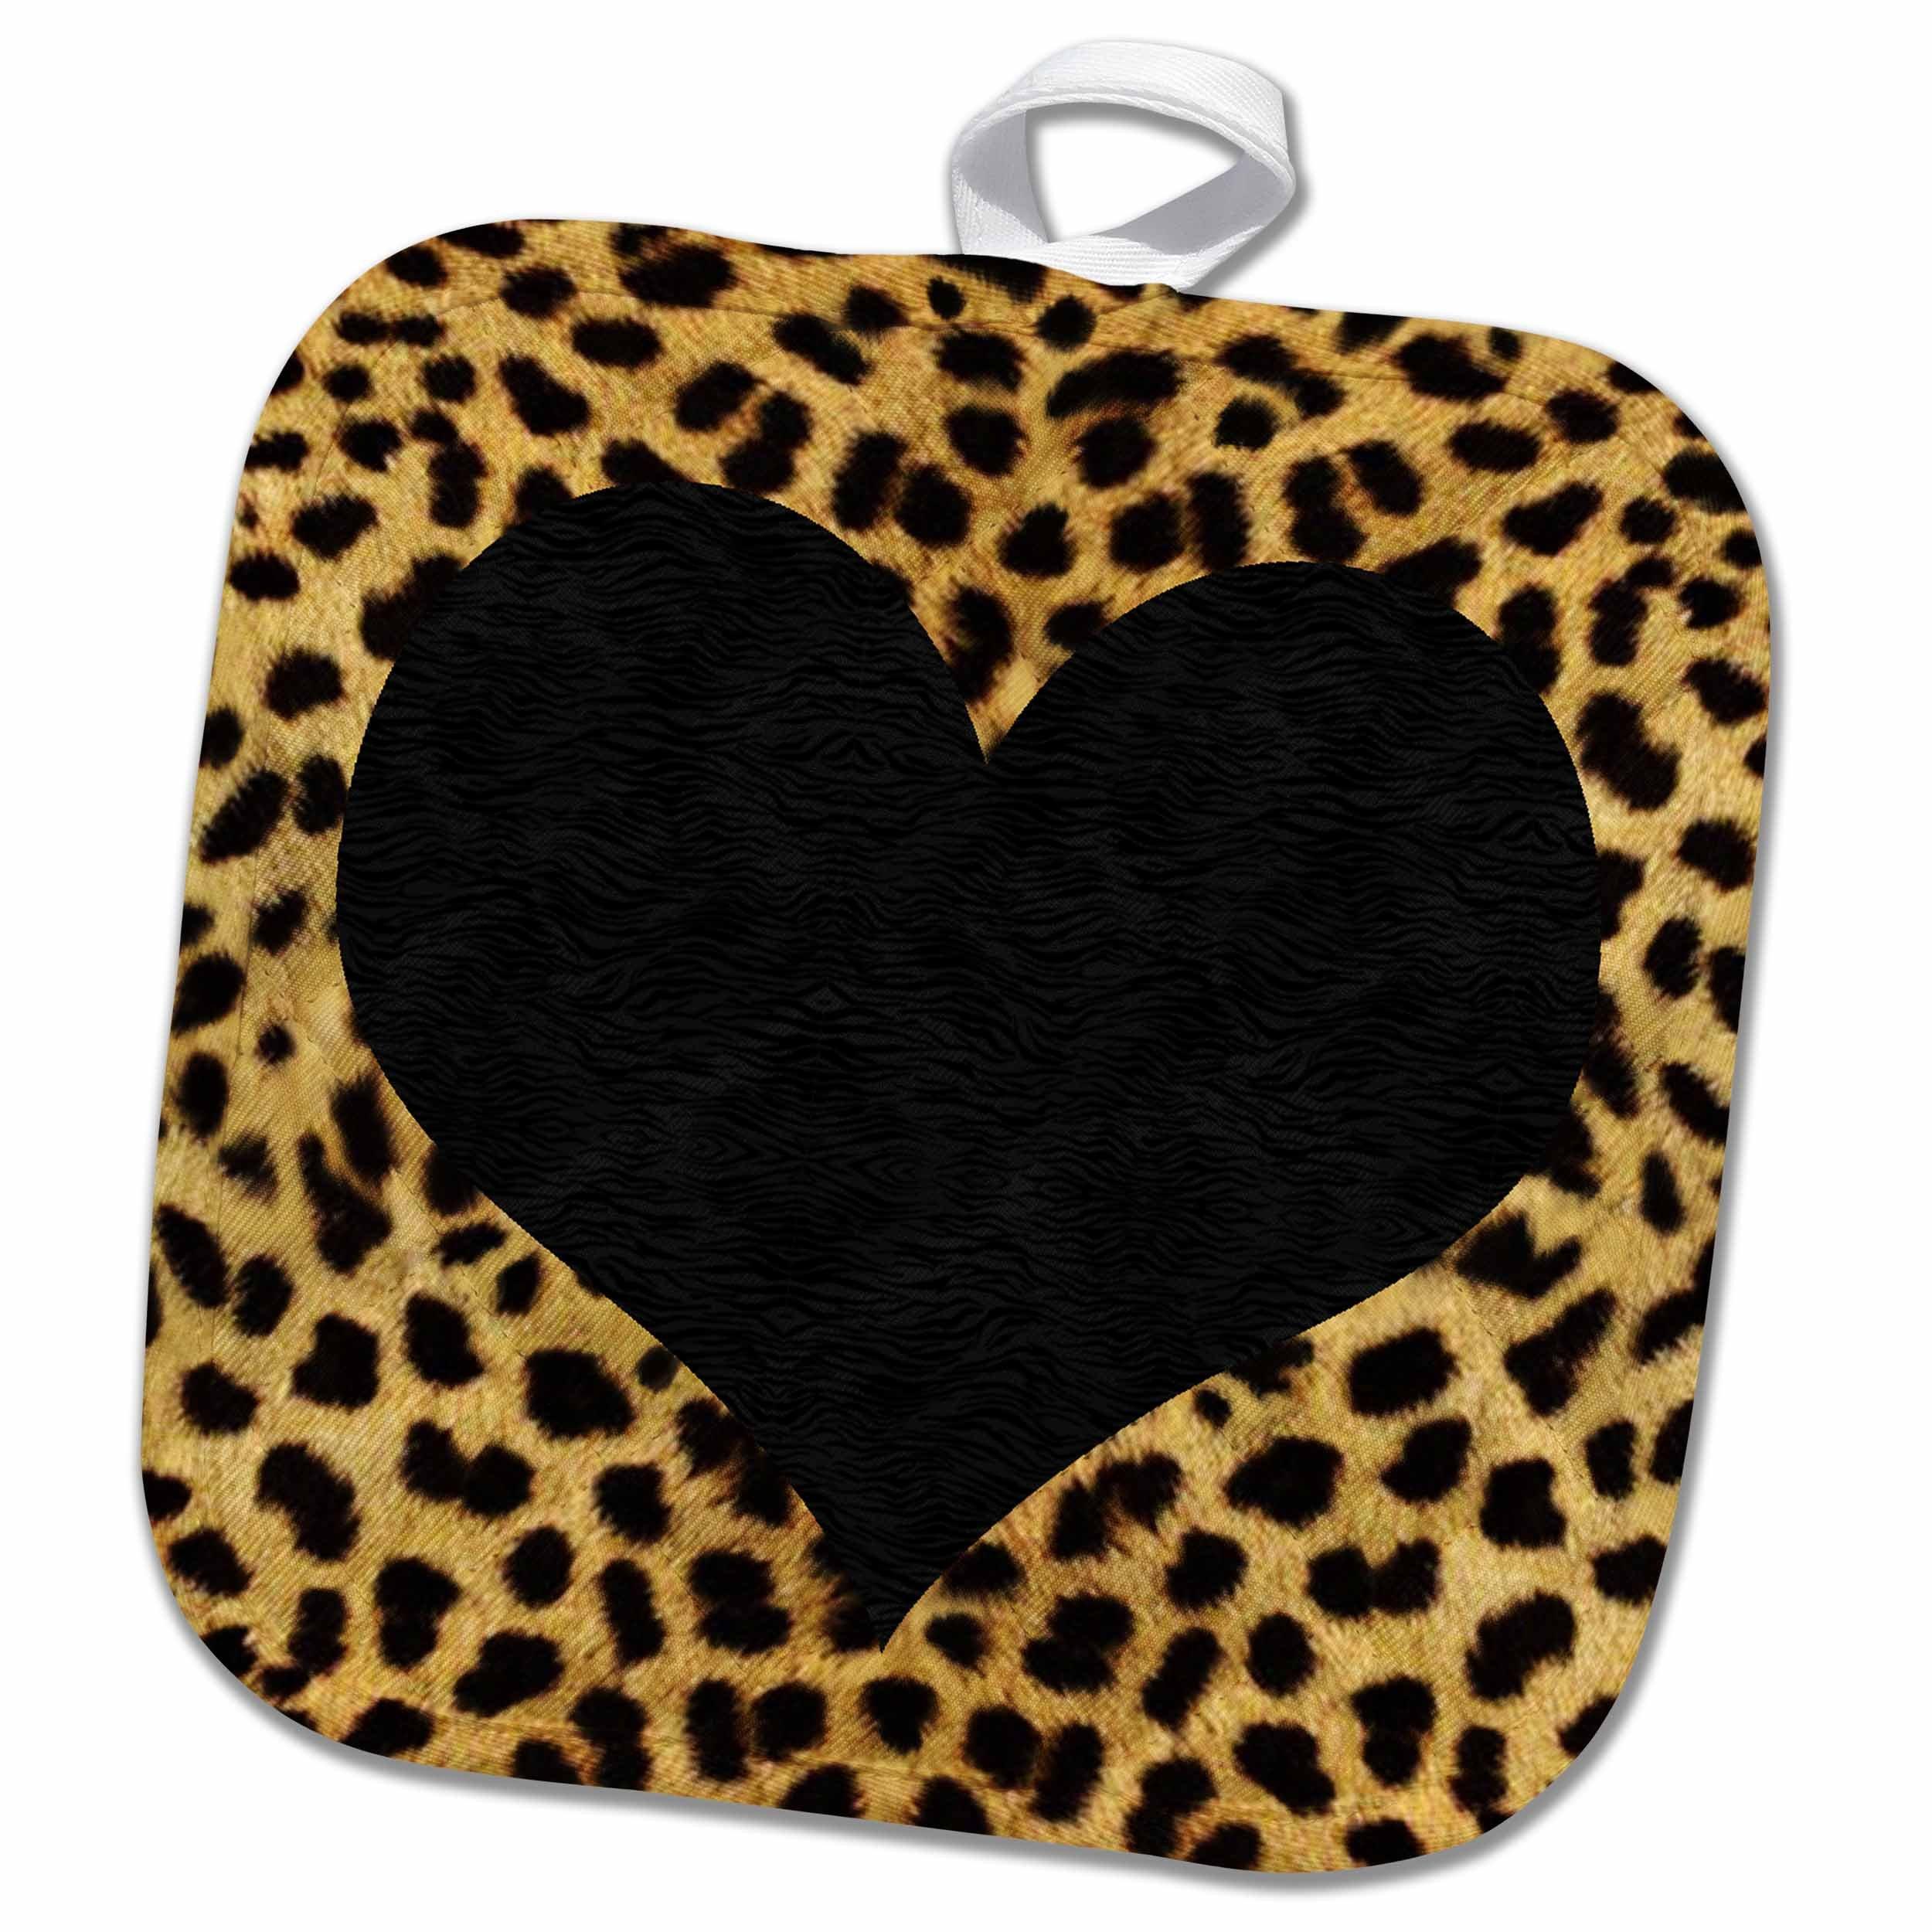 3dRose Punk Rockabilly Cheetah Animal Print Black Heart Potholders, 8'' x 8'', White